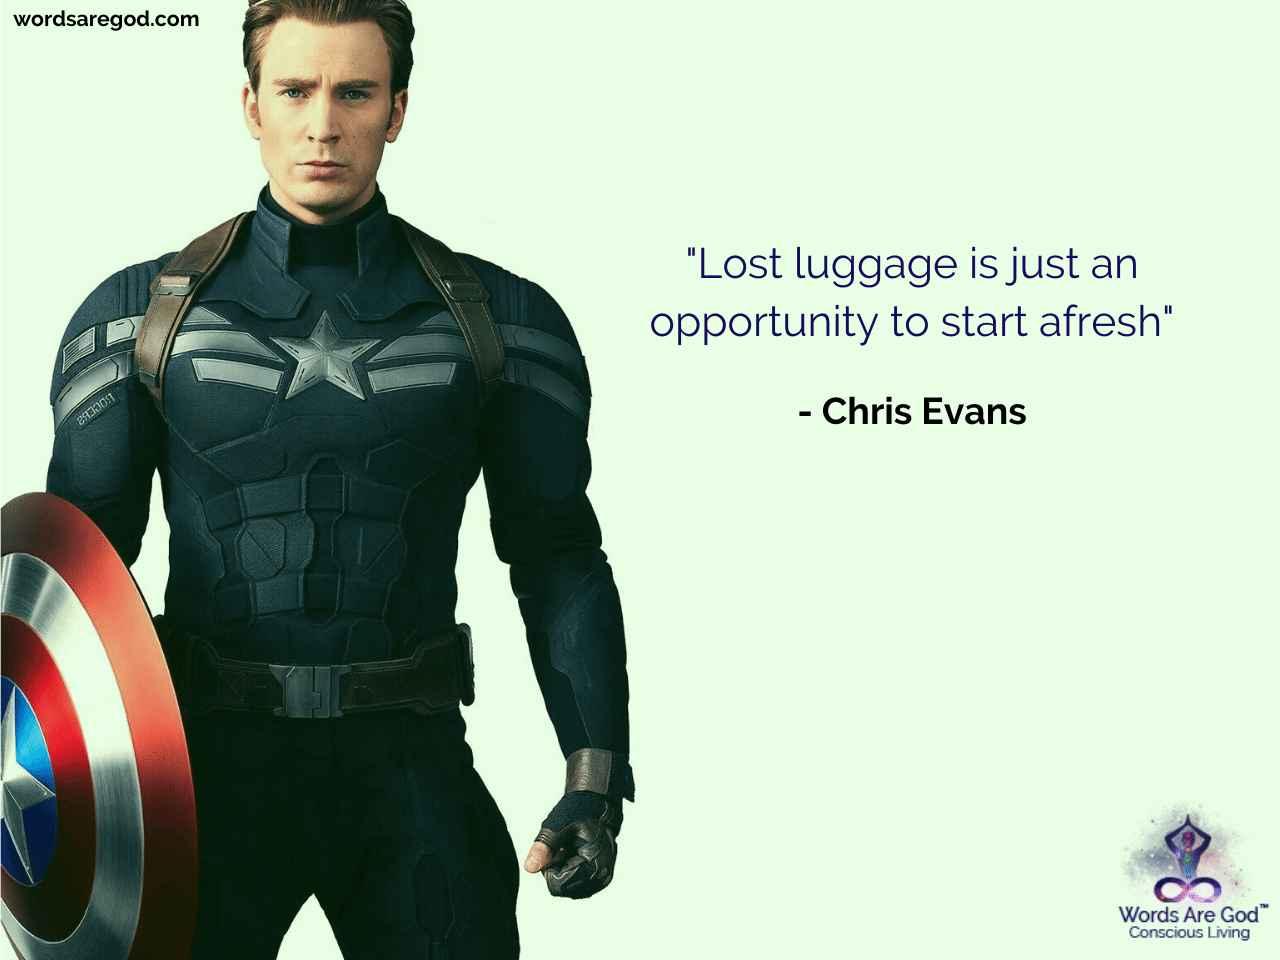 Chris Evans Inspirational Quote